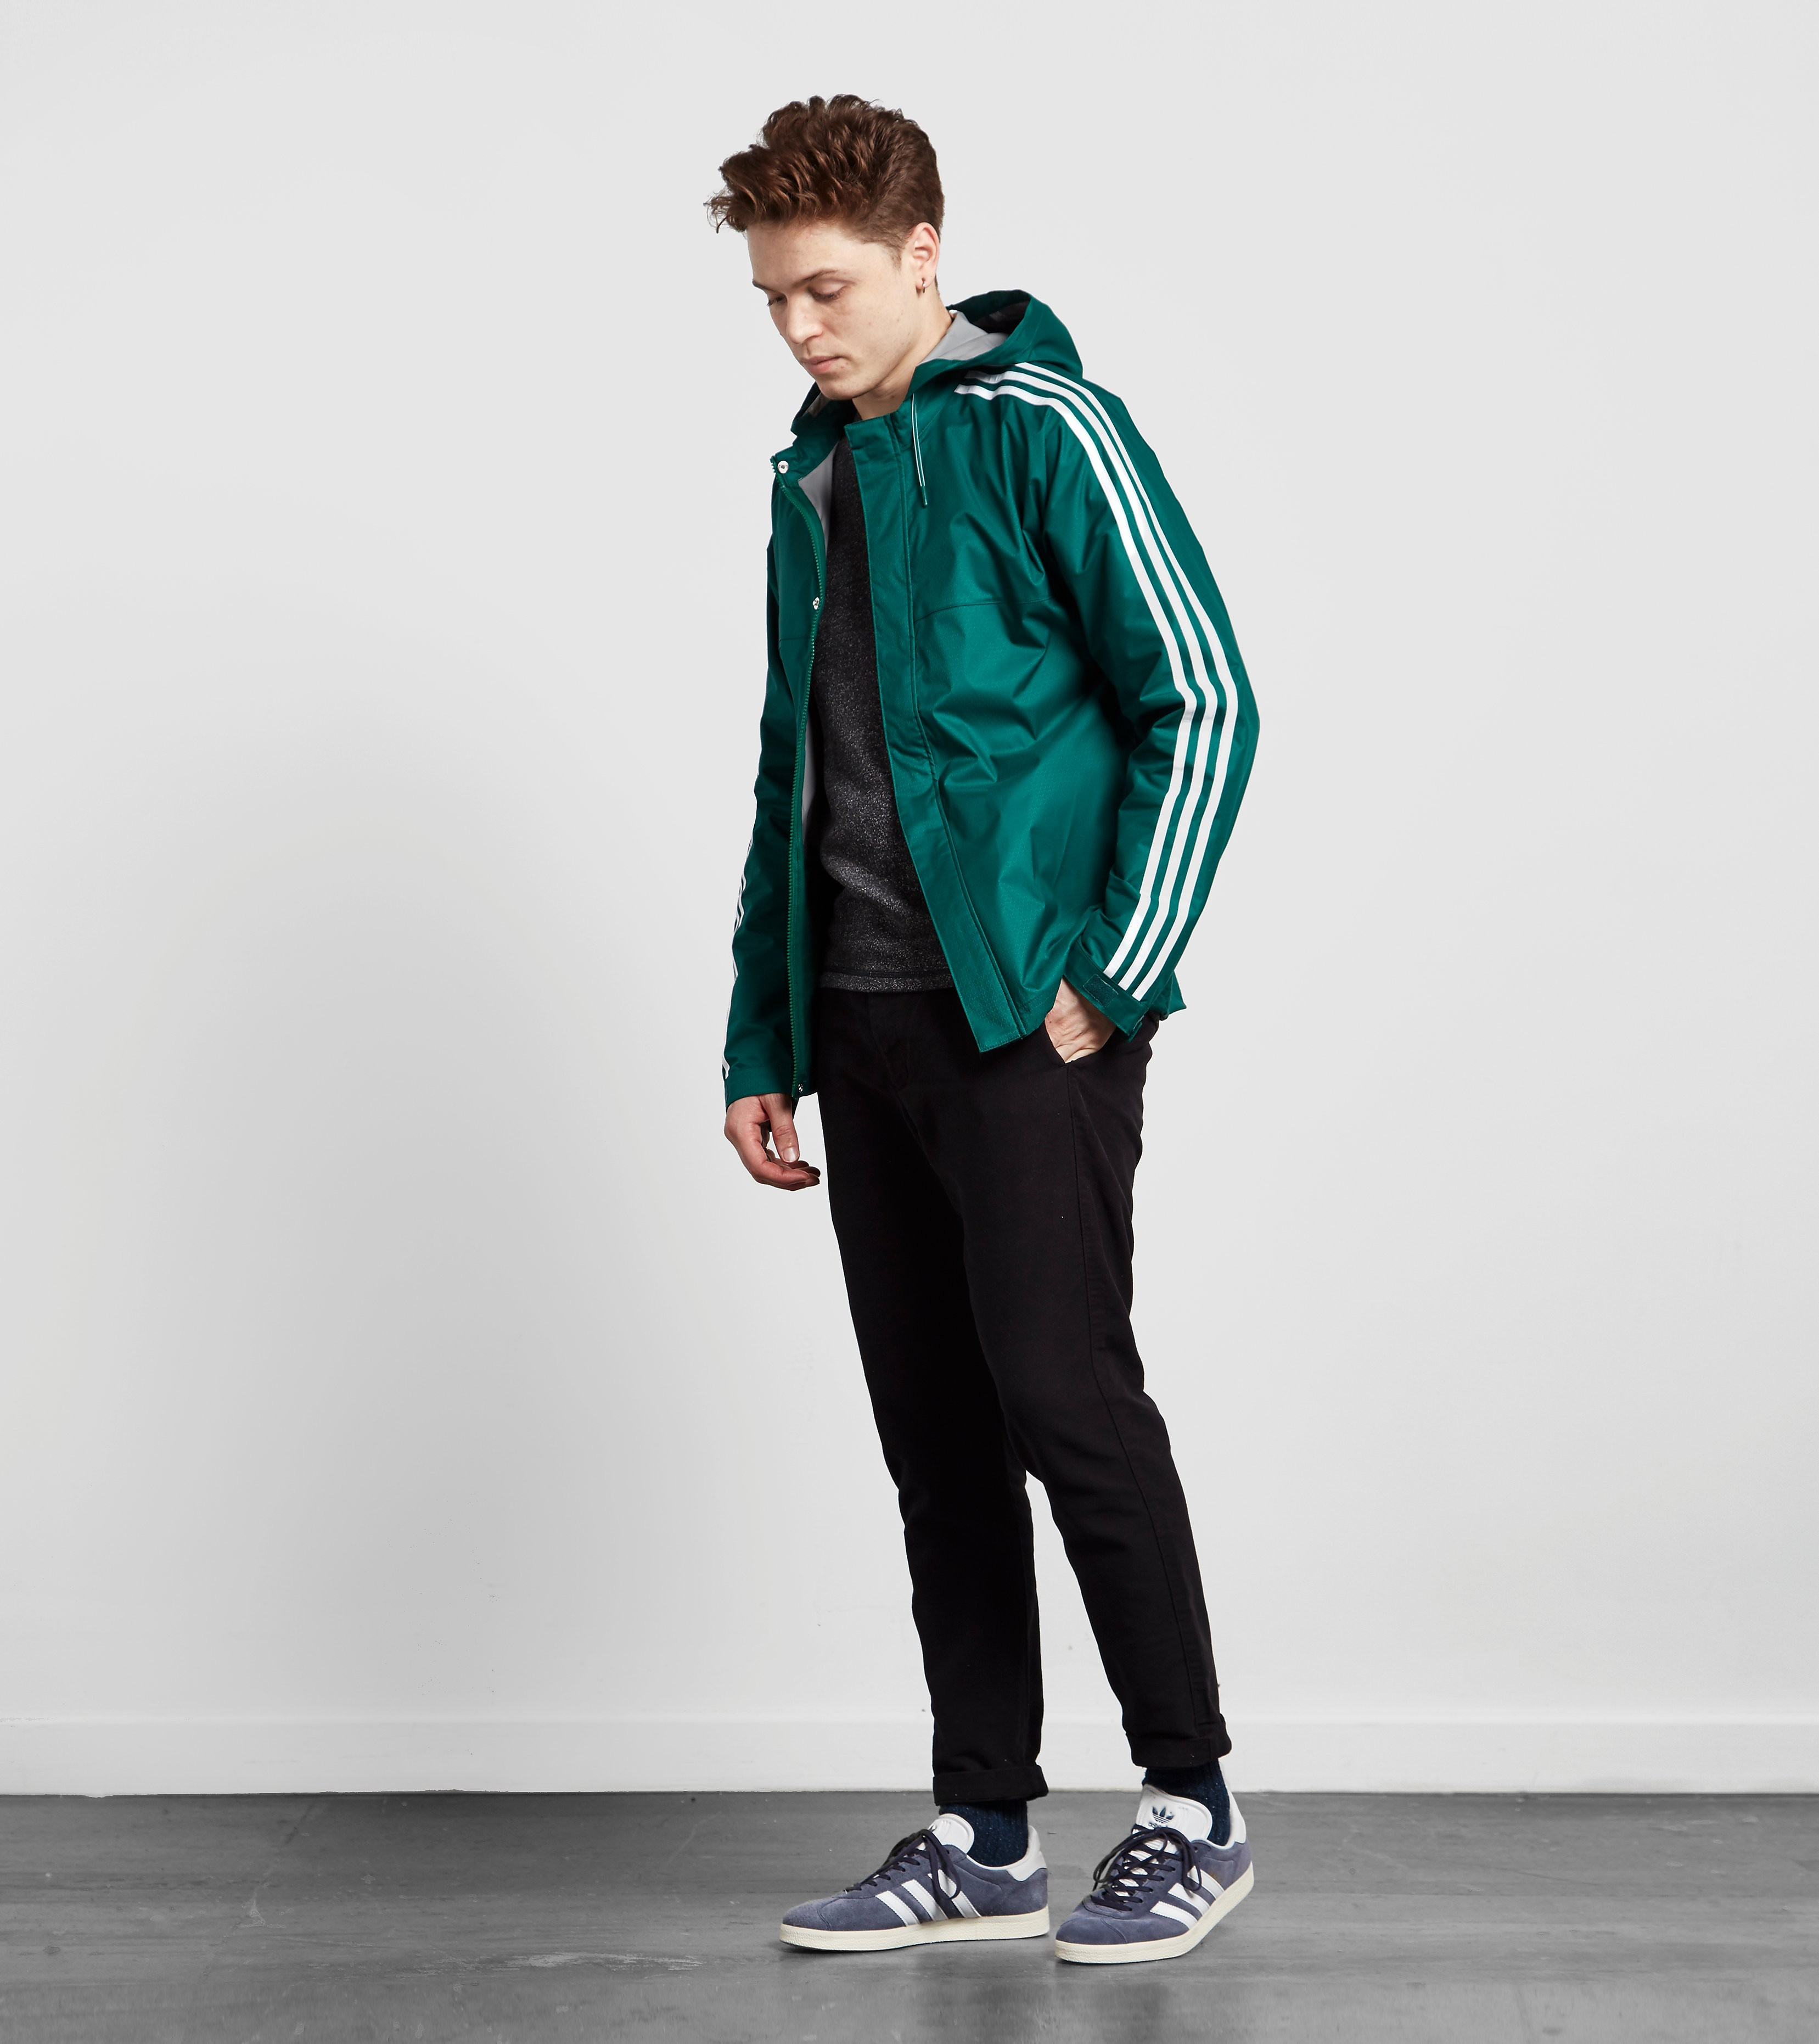 adidas Originals Spezial Windbreaker Jacket - size? Exclusive